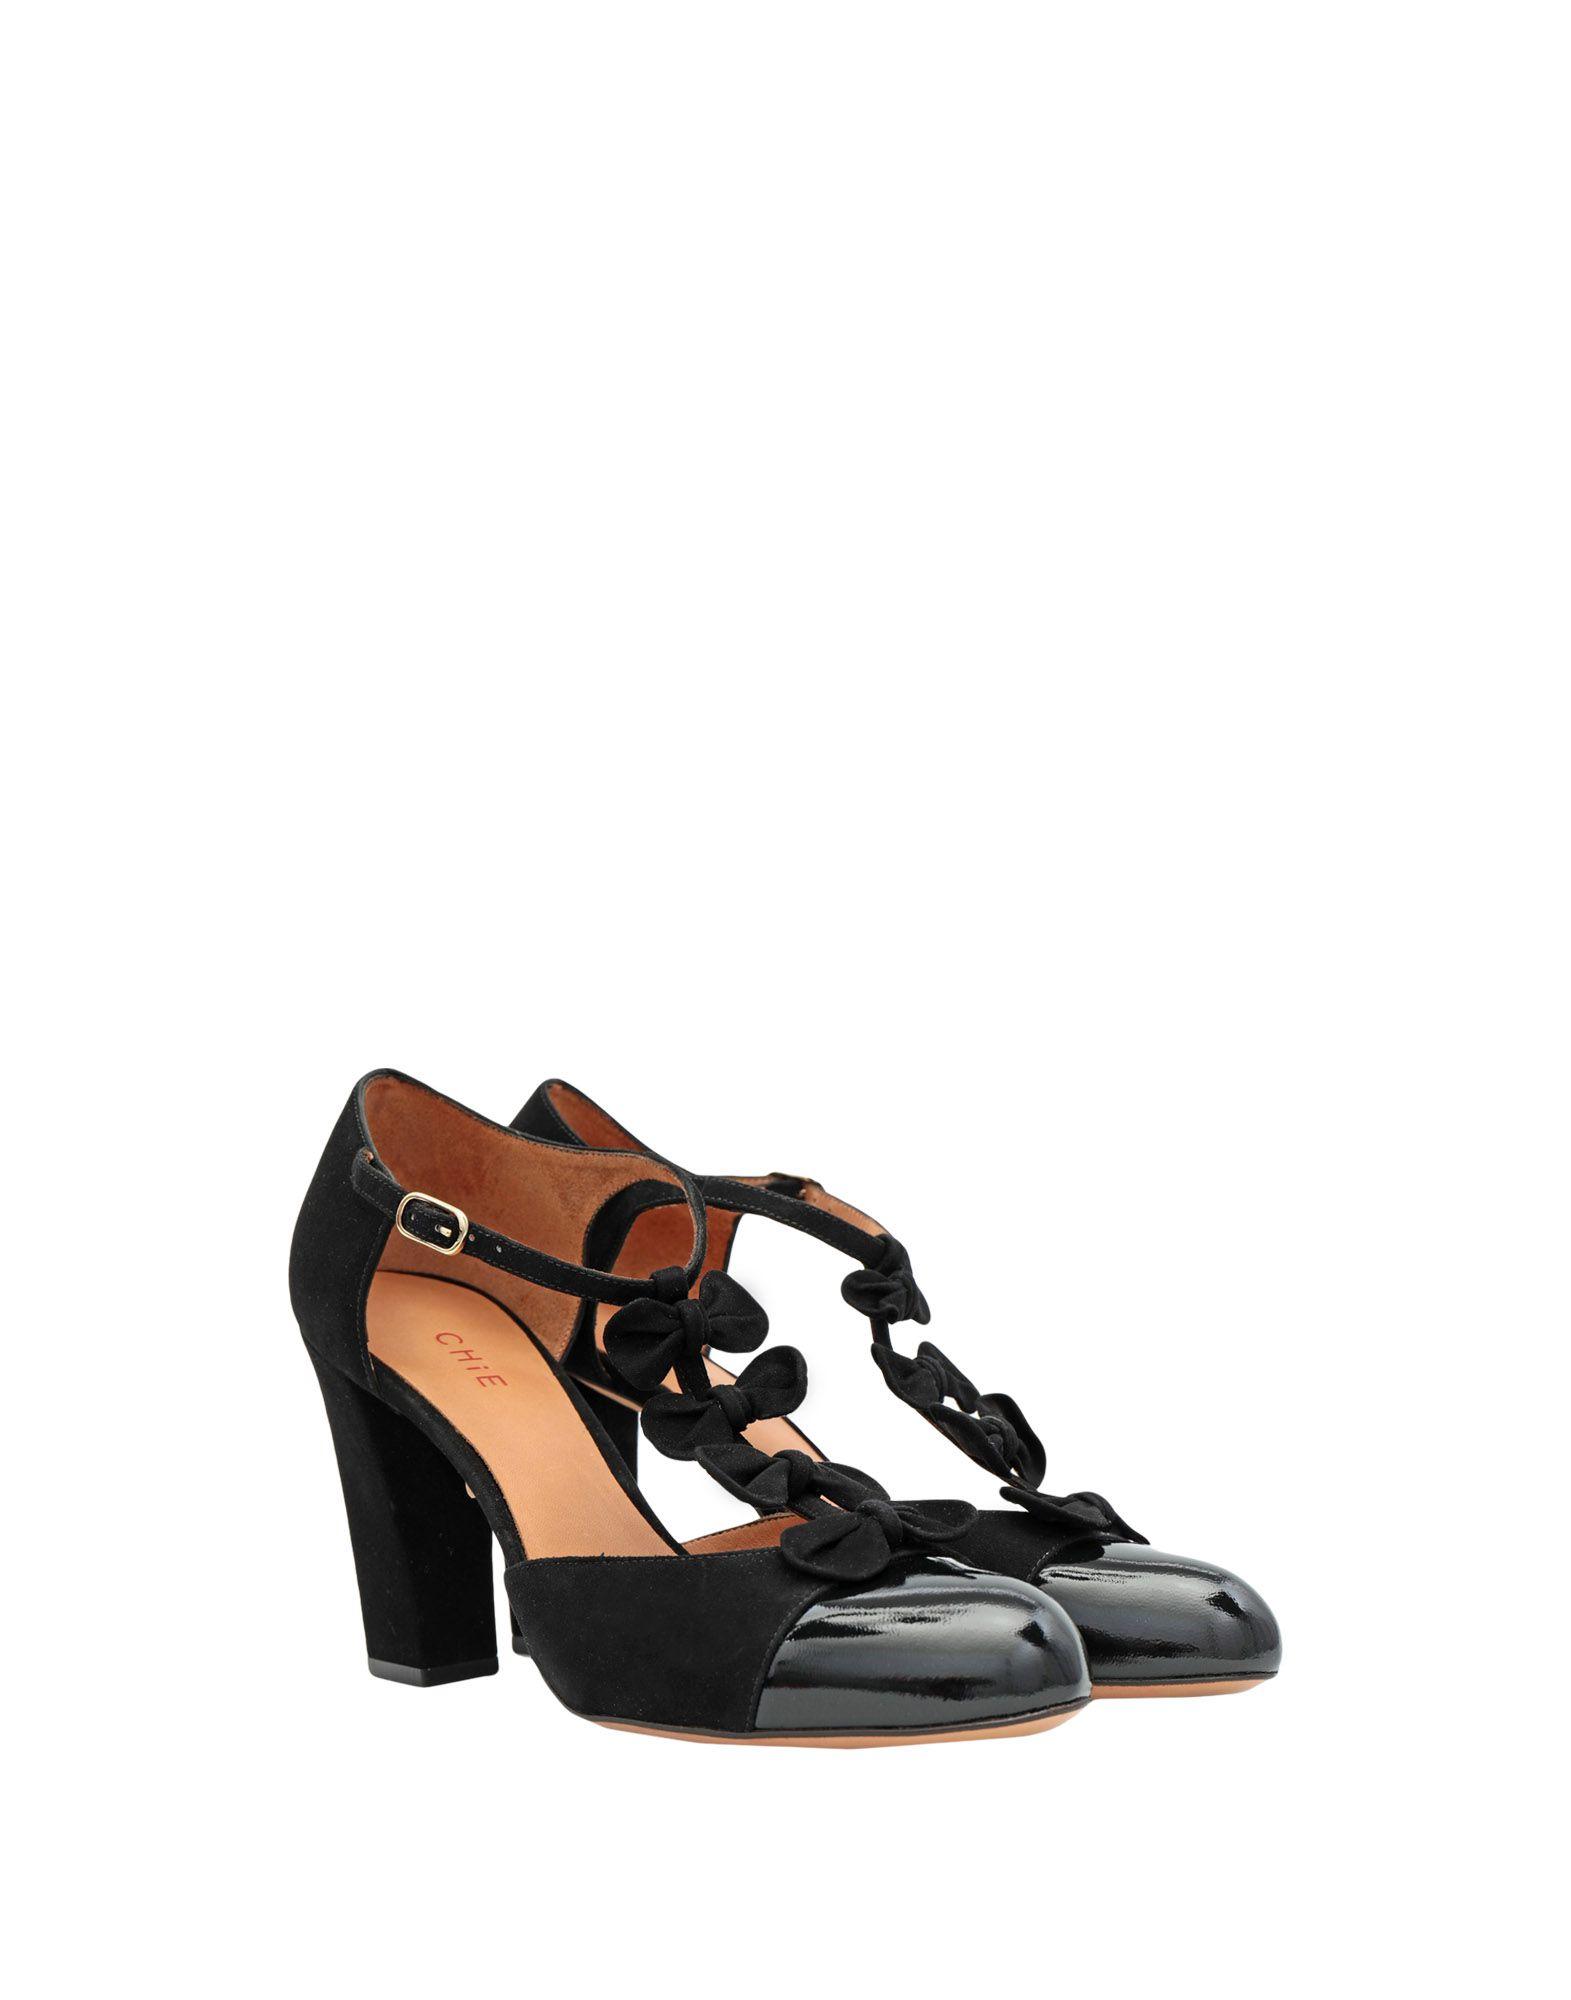 Chie By Chie Mihara gut Pumps Damen  11549453QWGünstige gut Mihara aussehende Schuhe d4a8c9